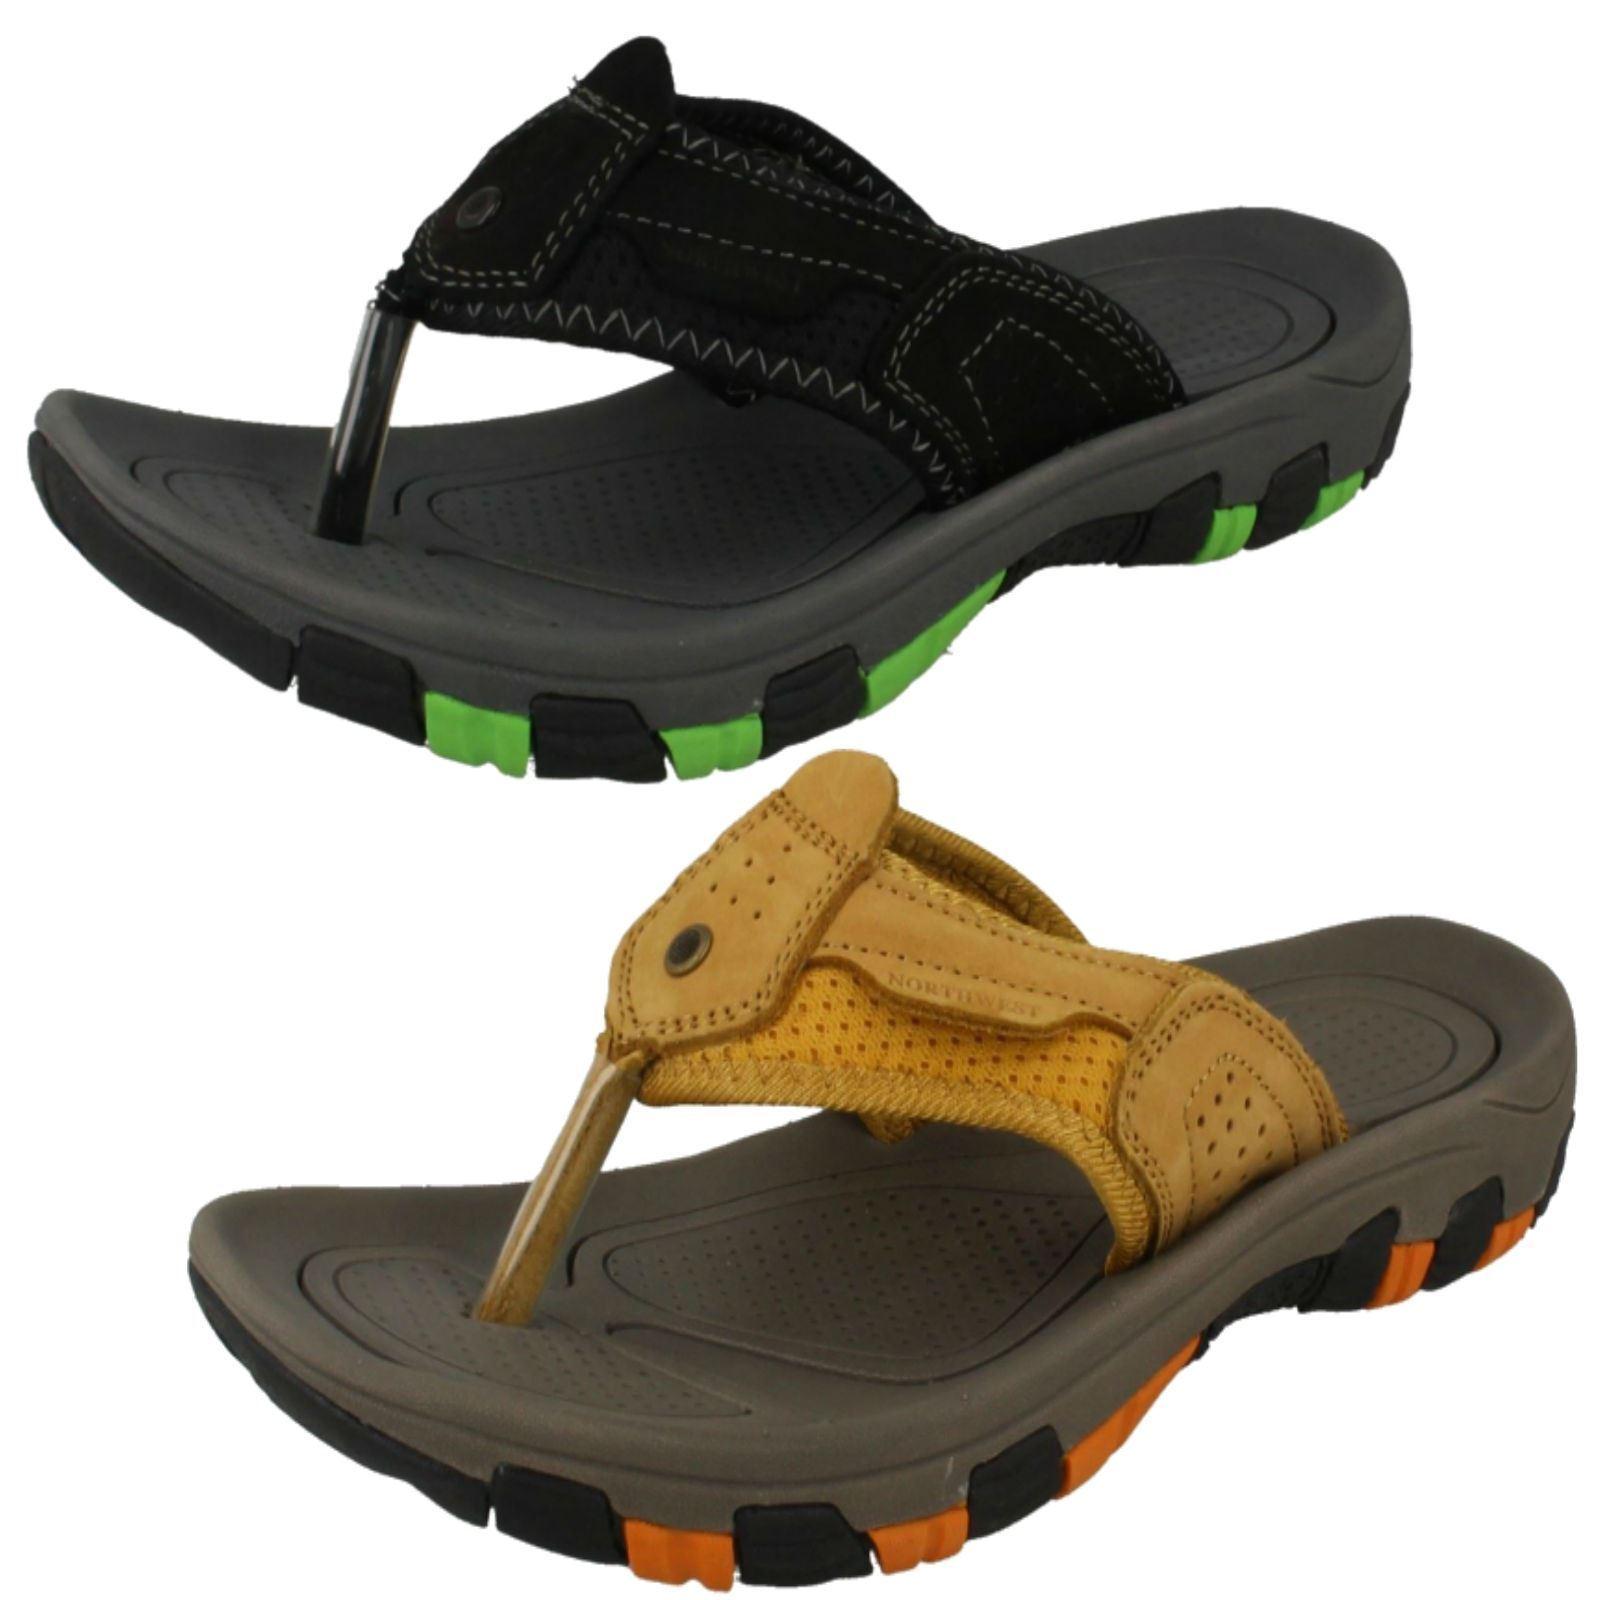 Mens Northwest Fiji Black Or Honey Leather Casual Toe Post Mule Sandals